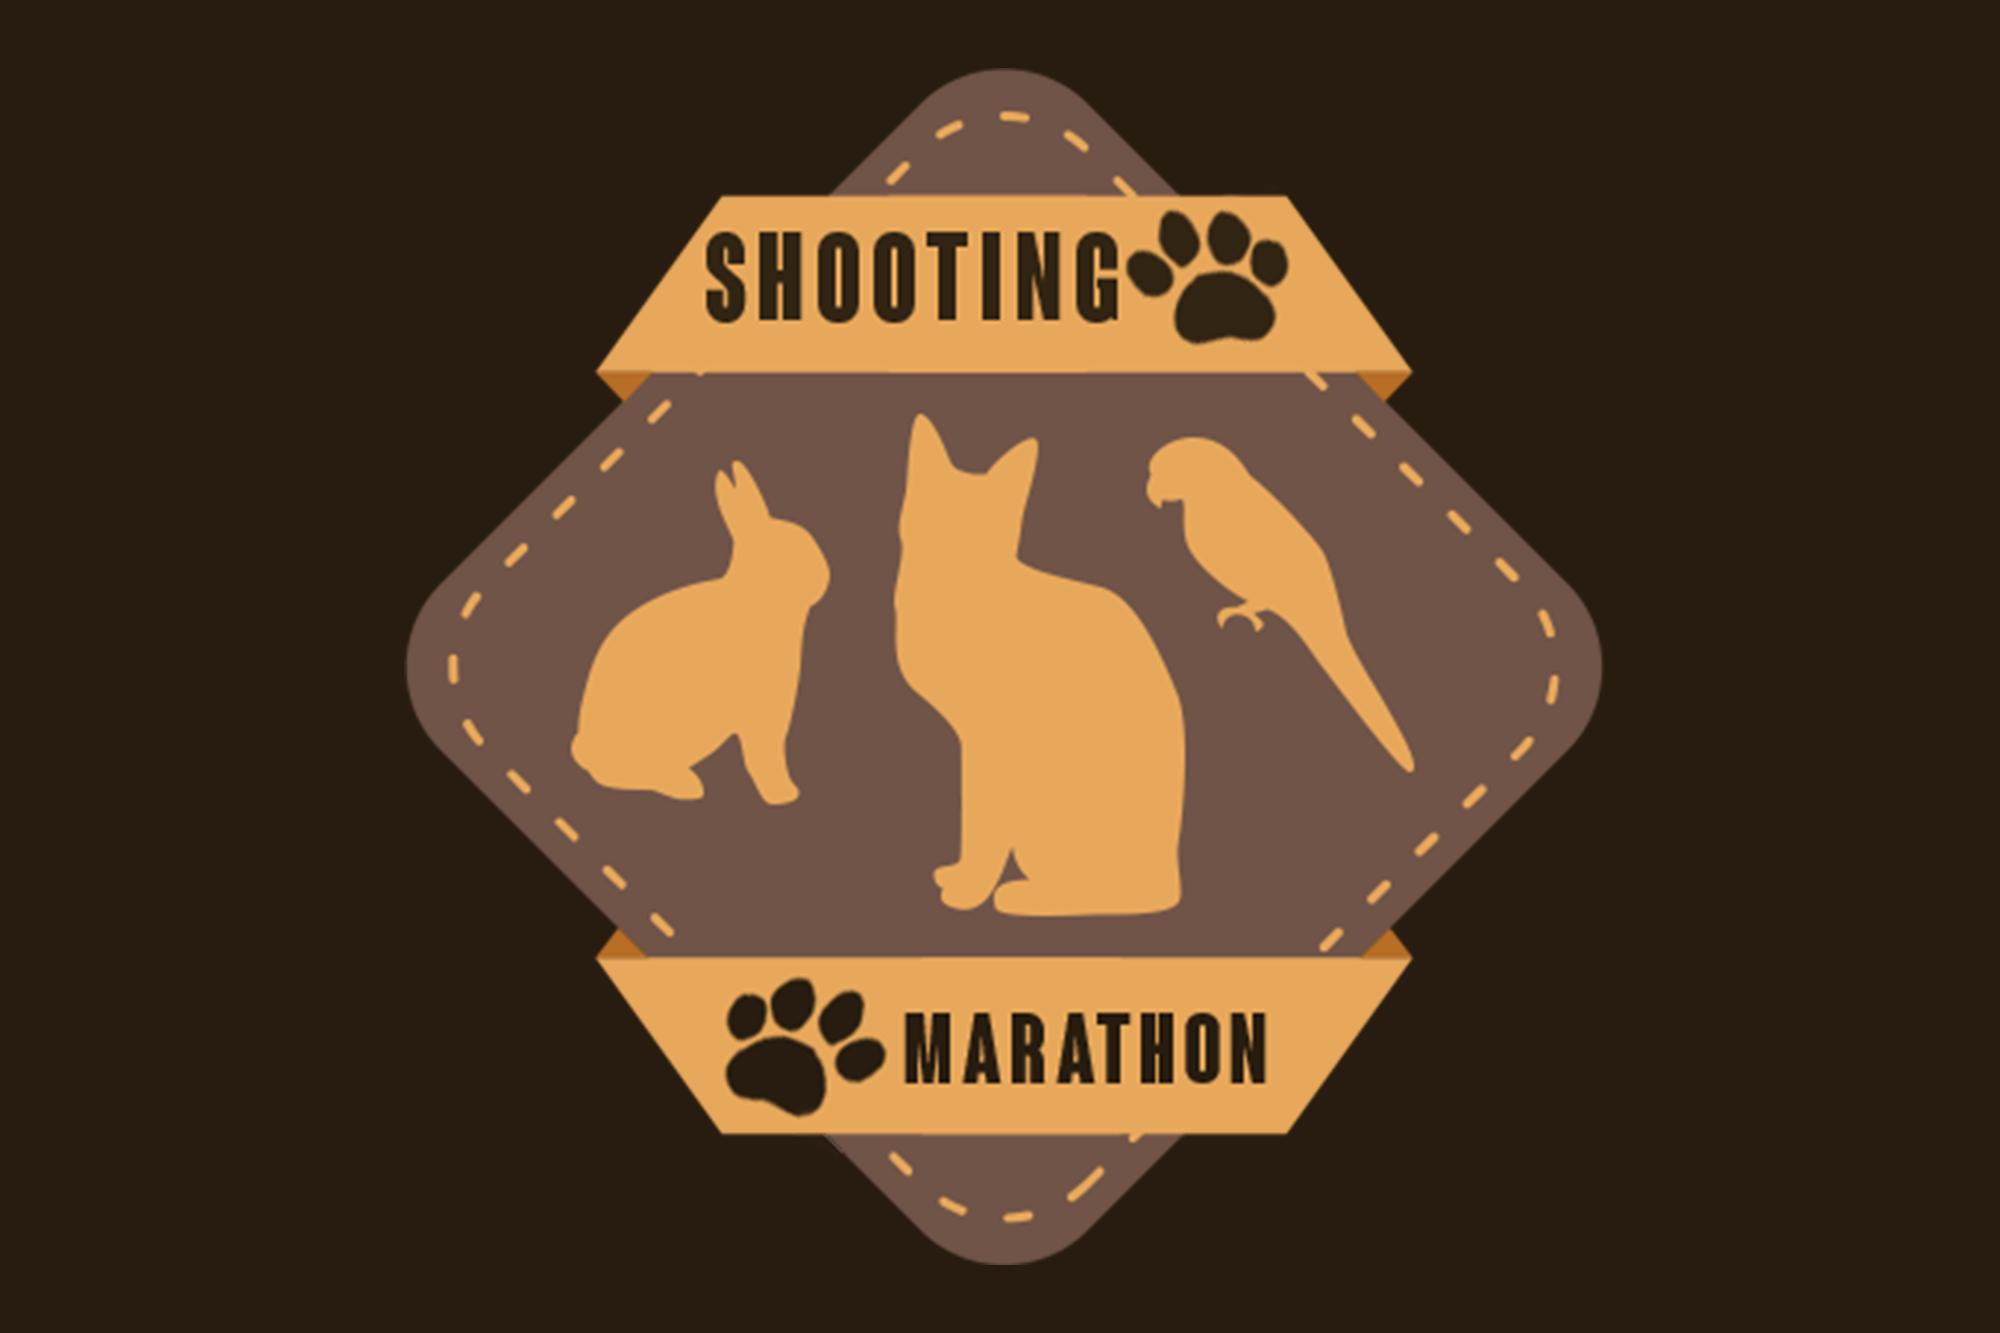 Shooting Marathon 2020